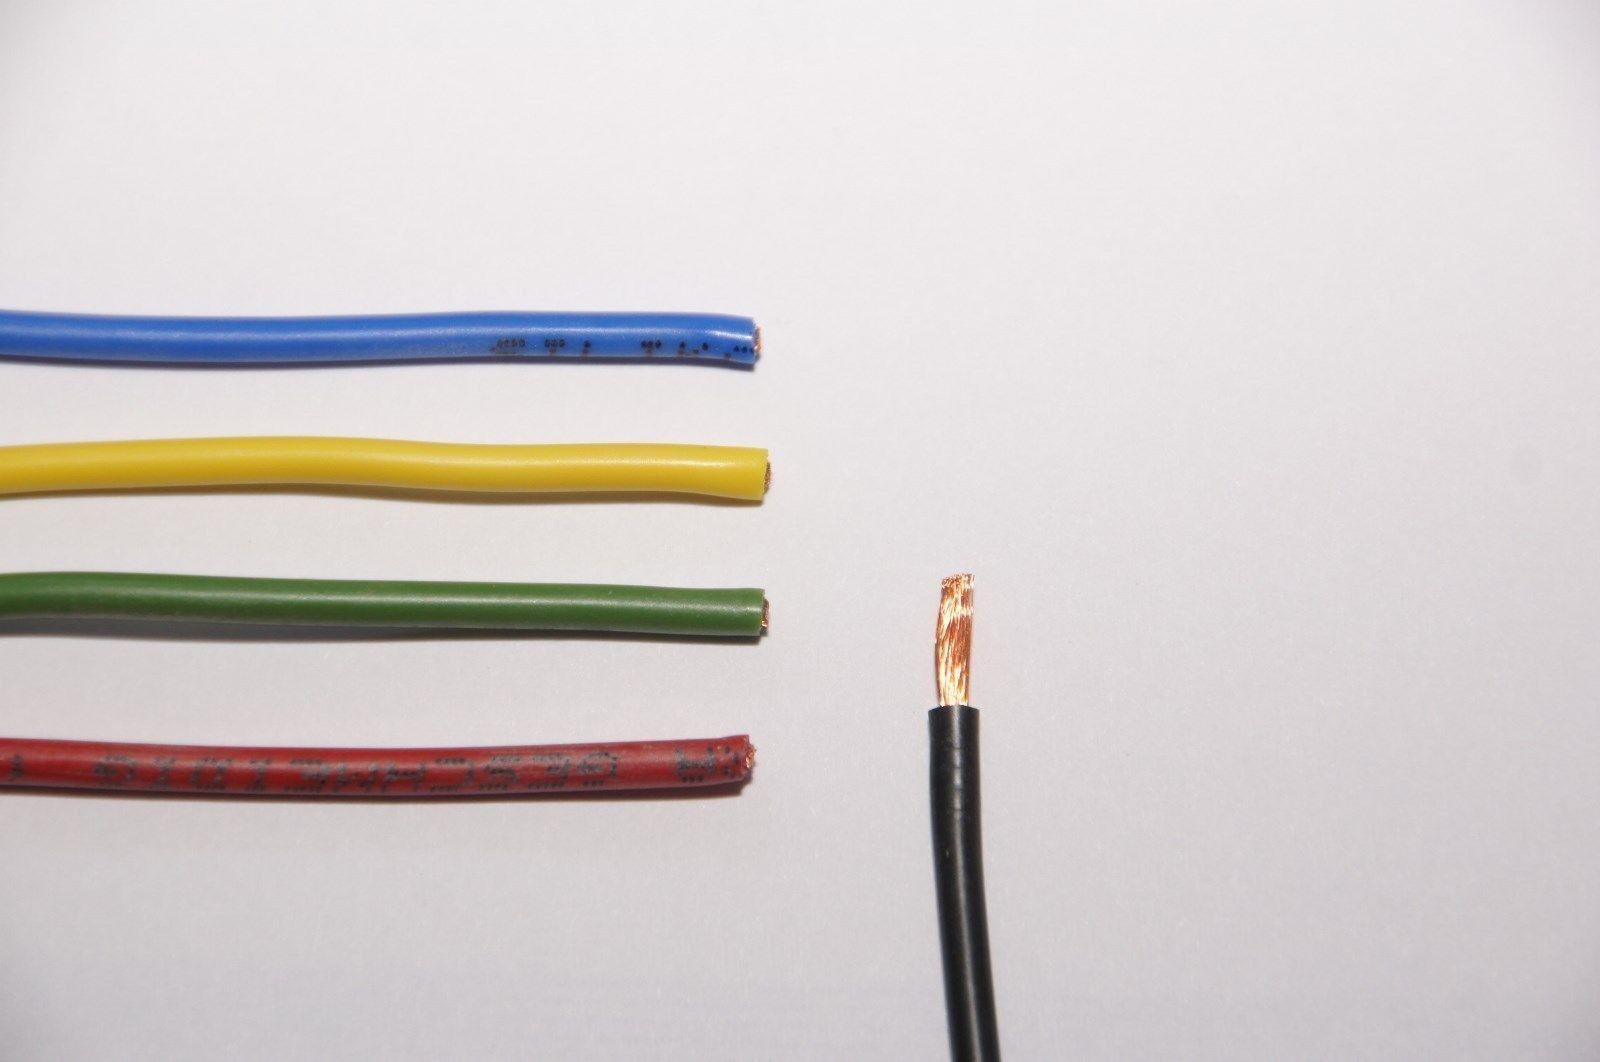 Silikonkabel hochflexibel, extra geschmeidig, 0,5mm², 0,75mm² & 1mm², je 1m